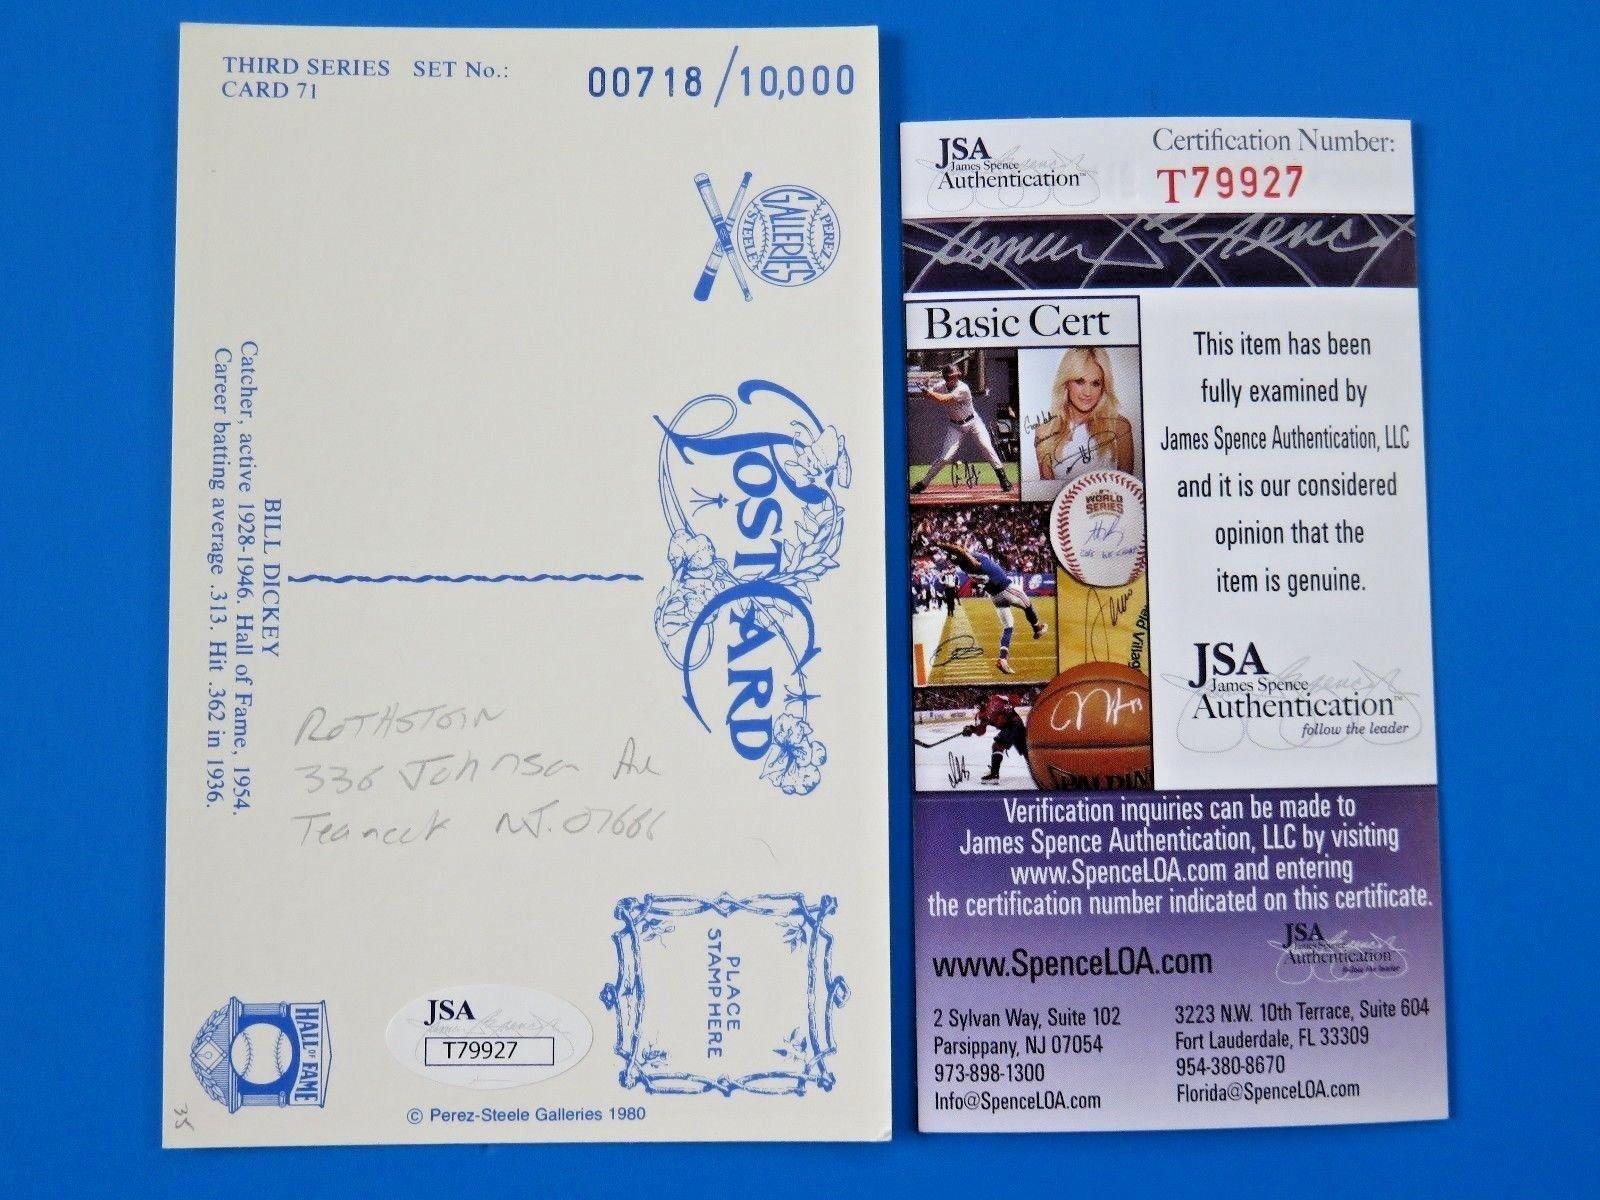 Bill Dickey Autographed Signed 1980 Perez Steele Postcard ~ Hof ~ Ny Yankees ~ JSA T79927